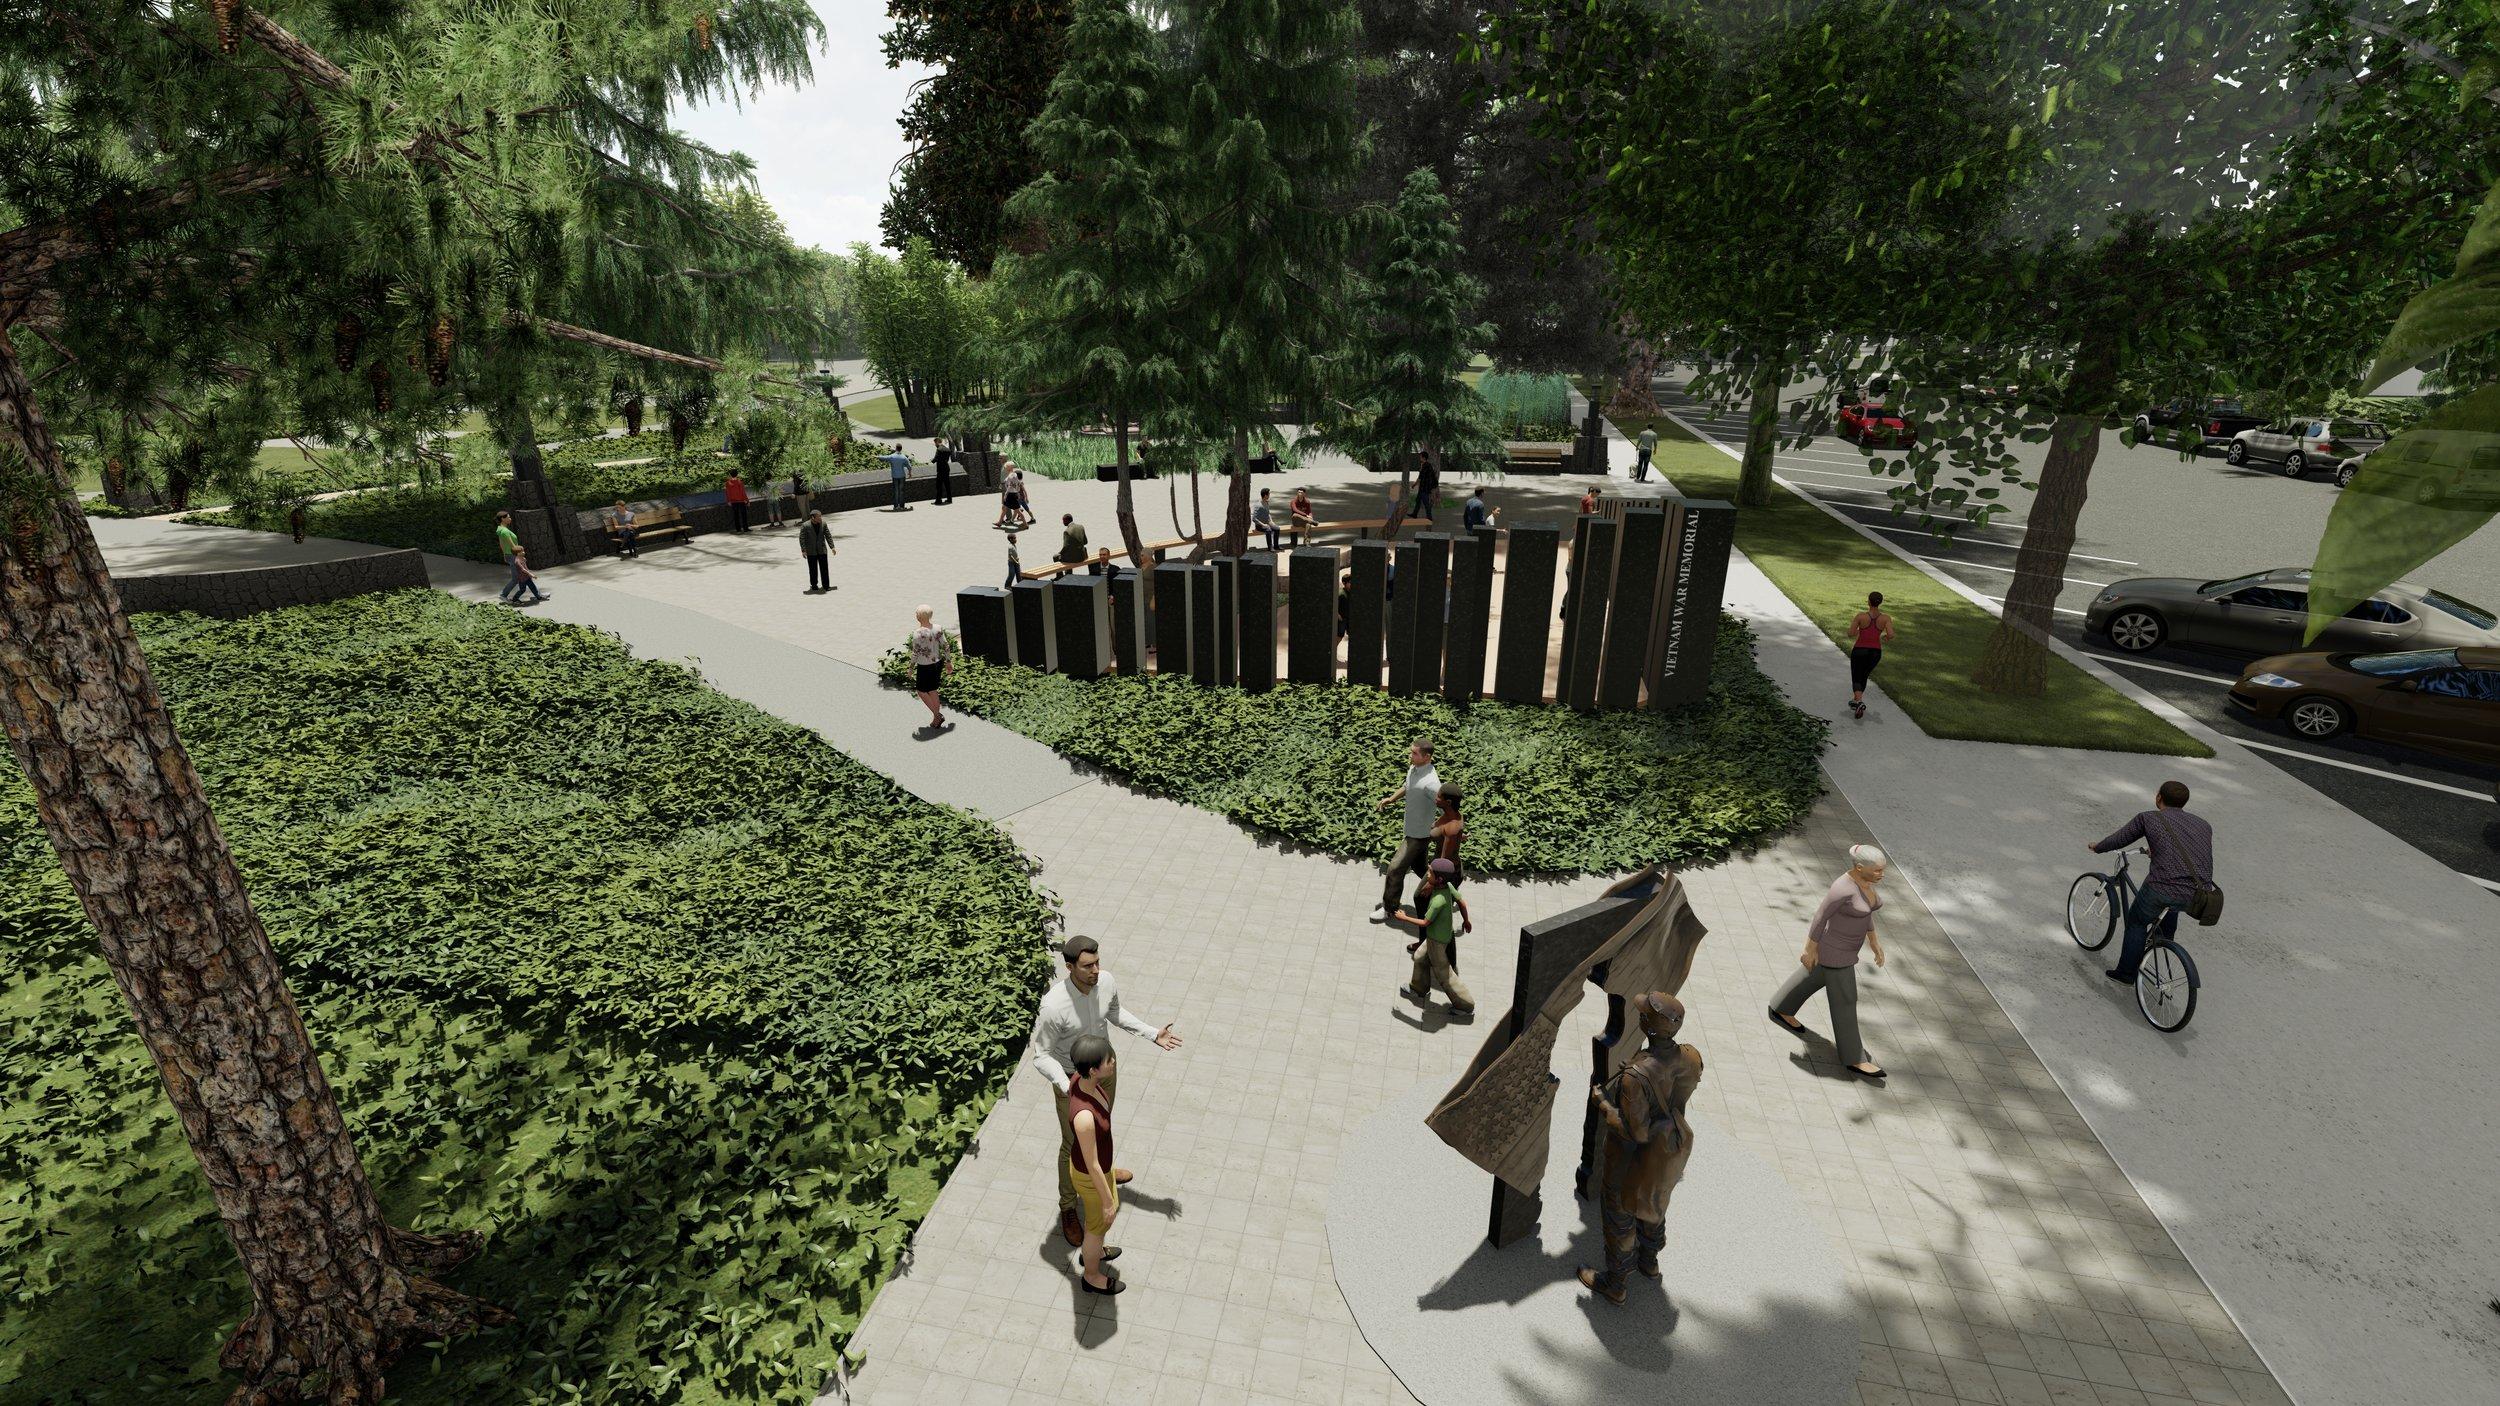 People under pine trees in a Vietnam war memorial